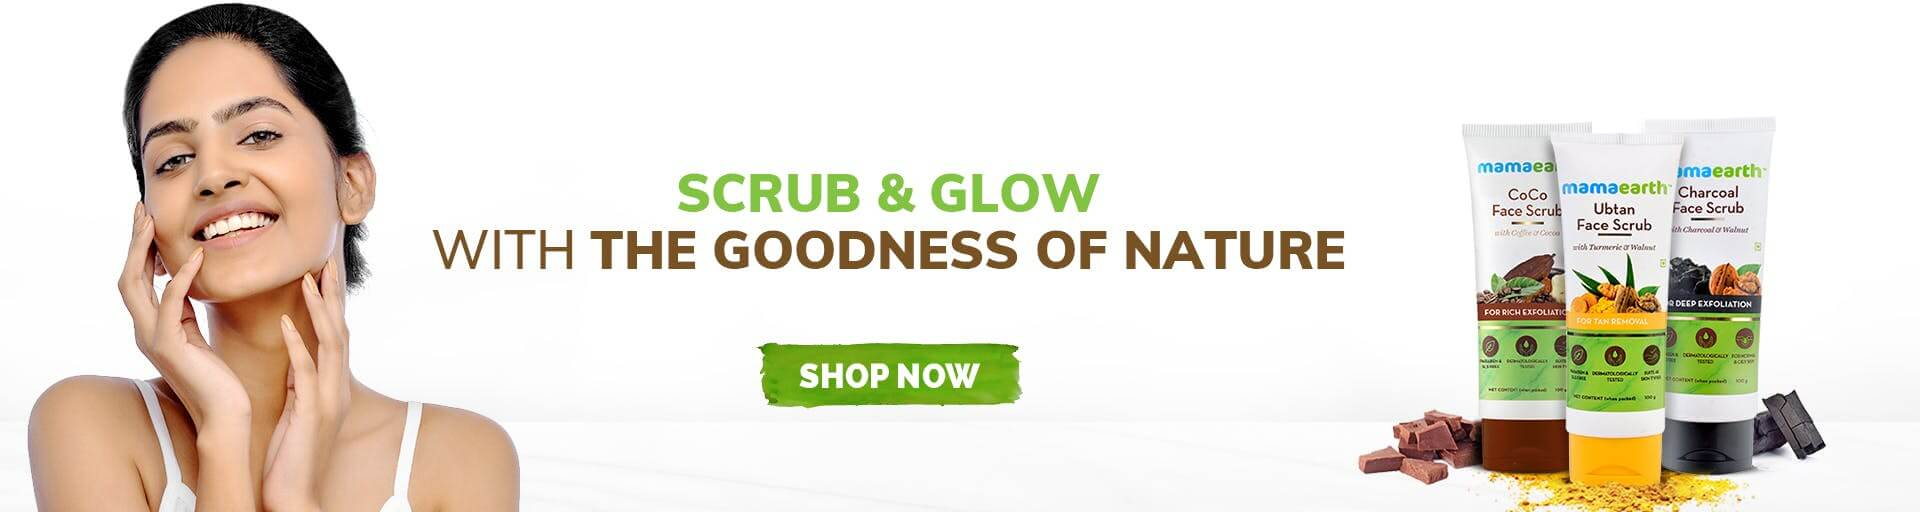 Scrub and Glow